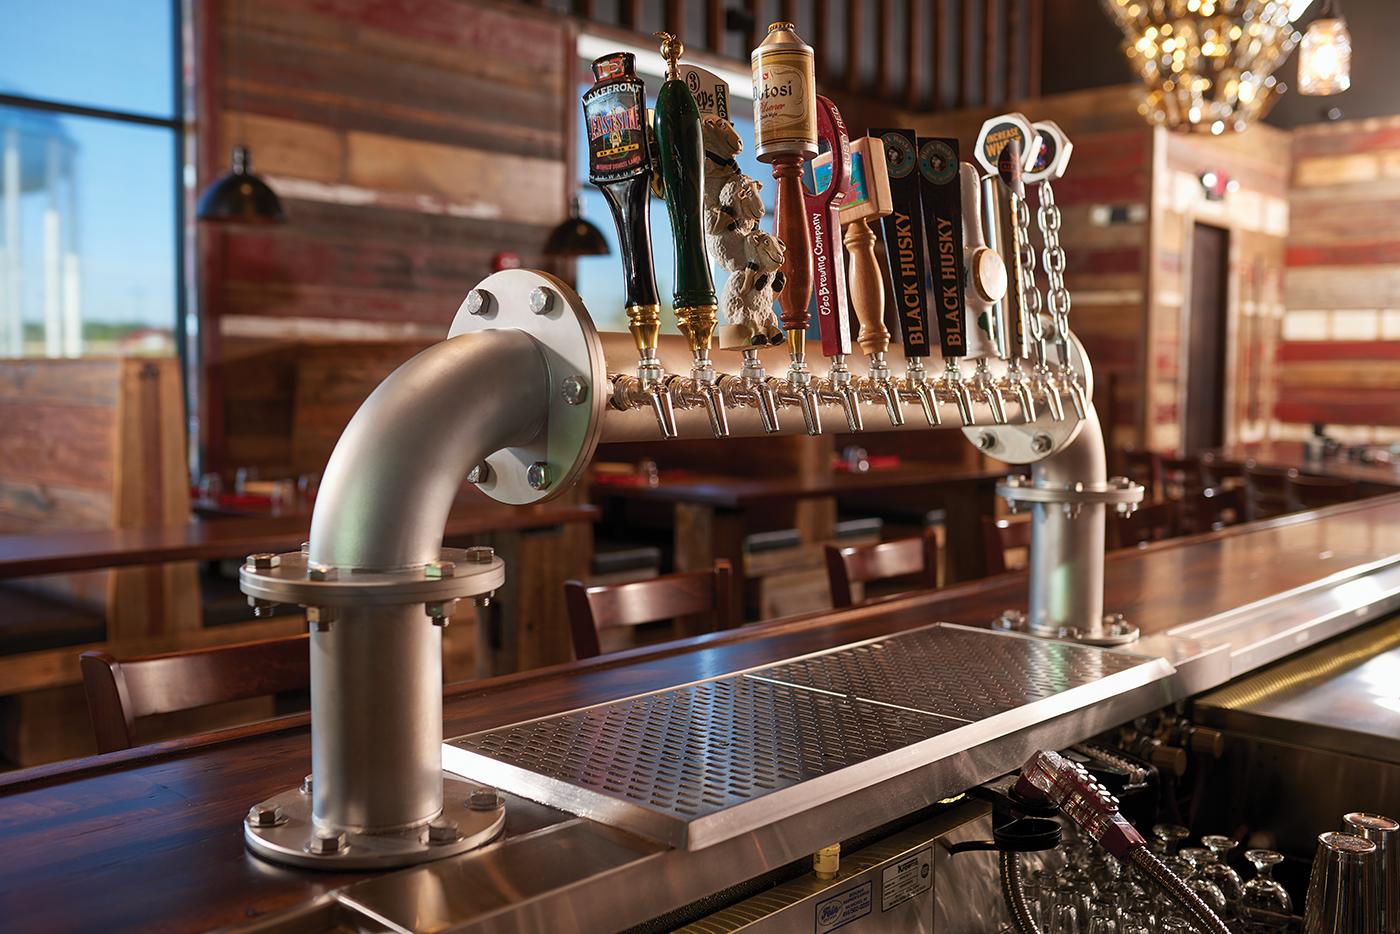 Perlick Beer System